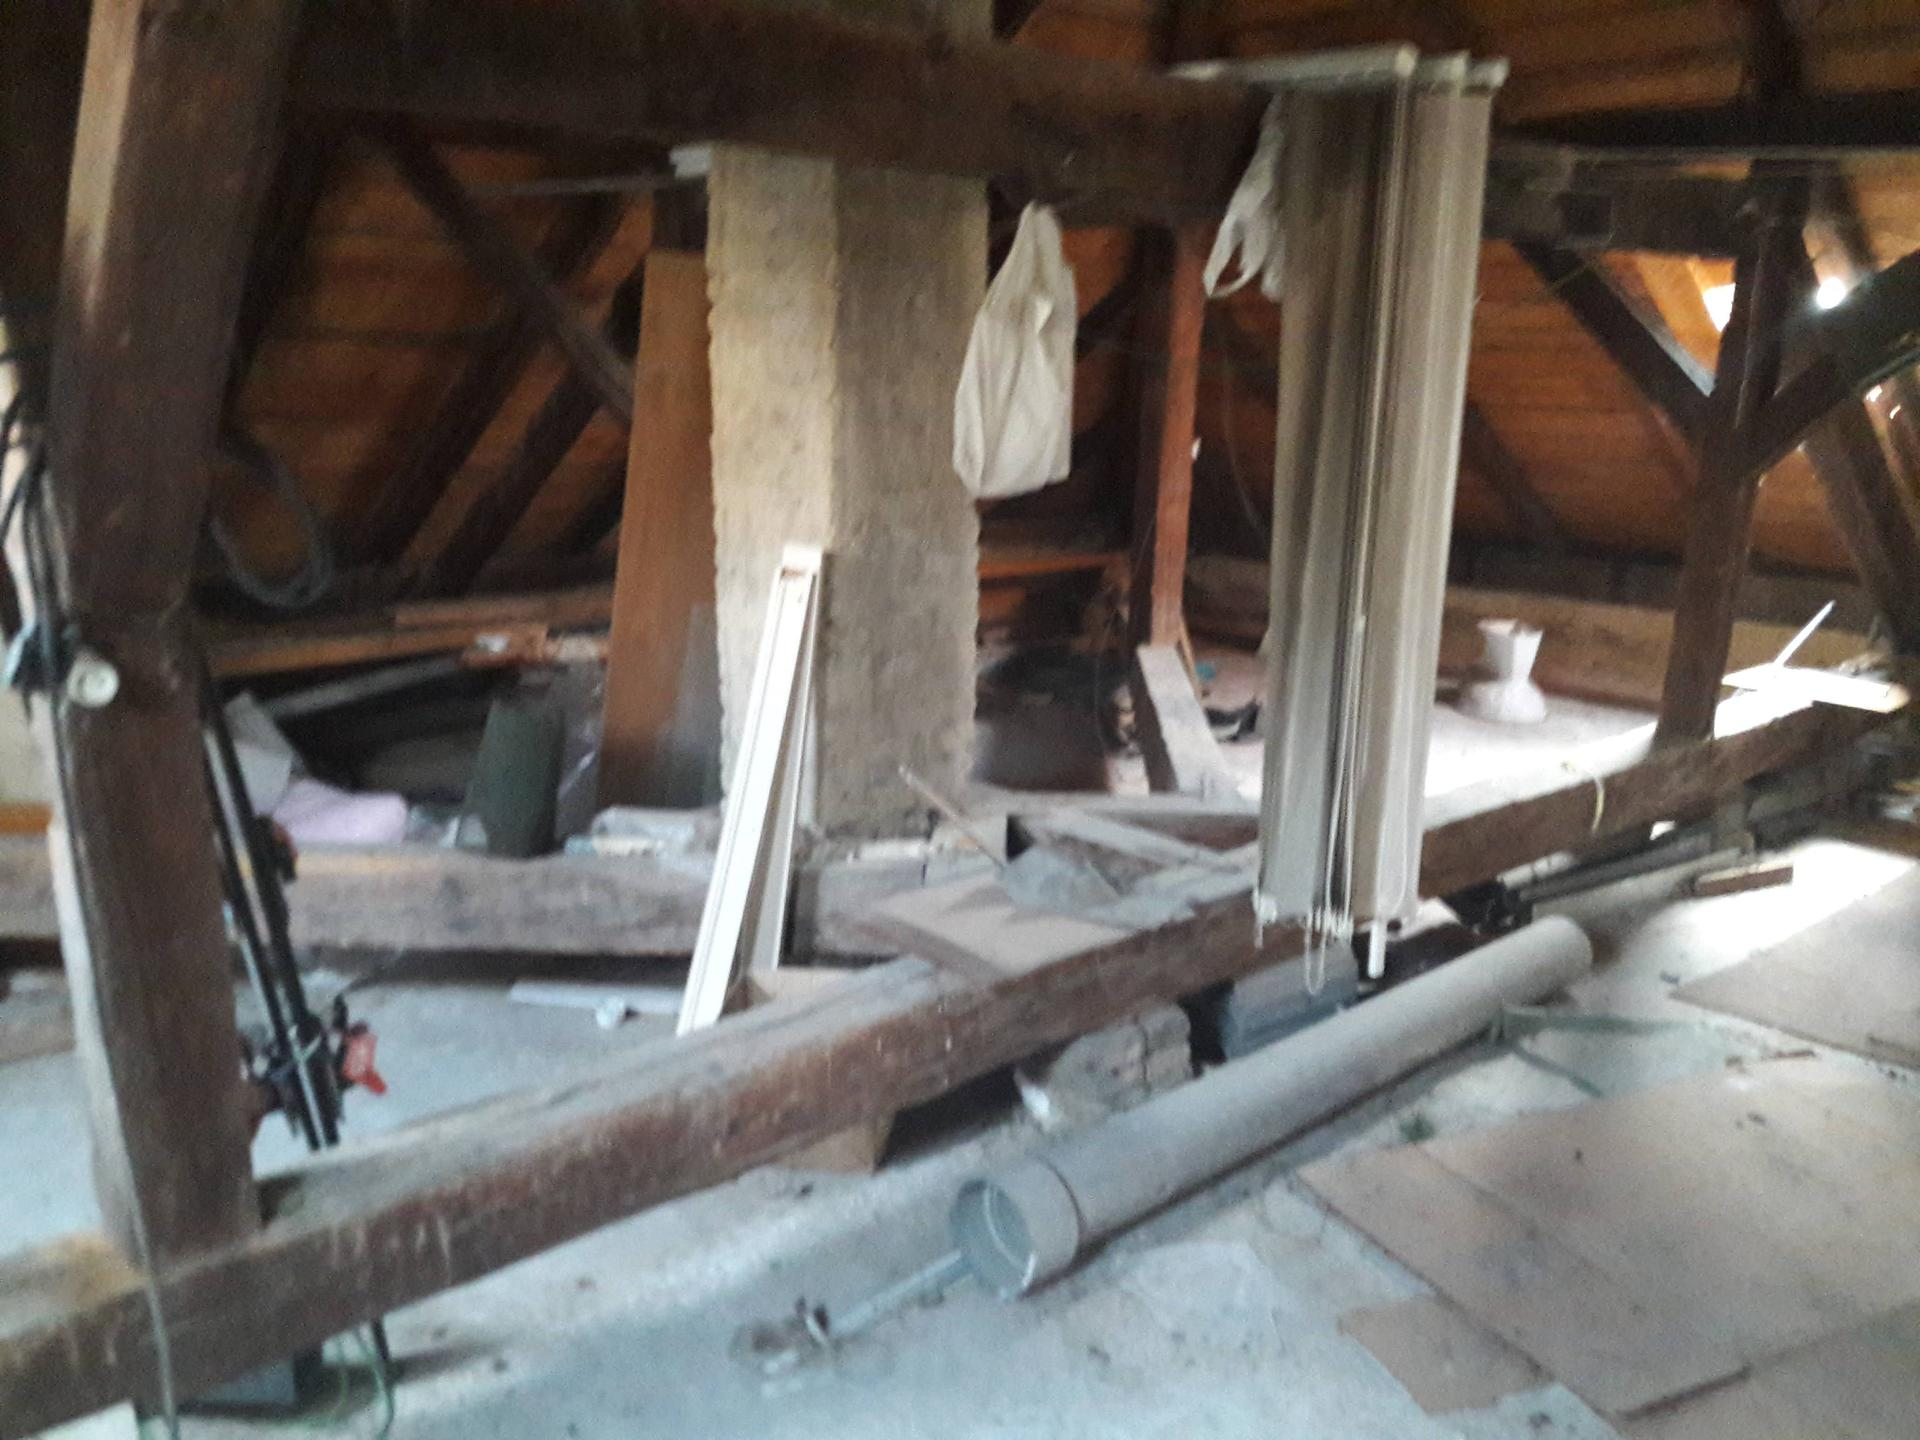 Prestavba podkrovia zo sedlovo valbovej na sedlovú strechu. - Obrázok č. 2